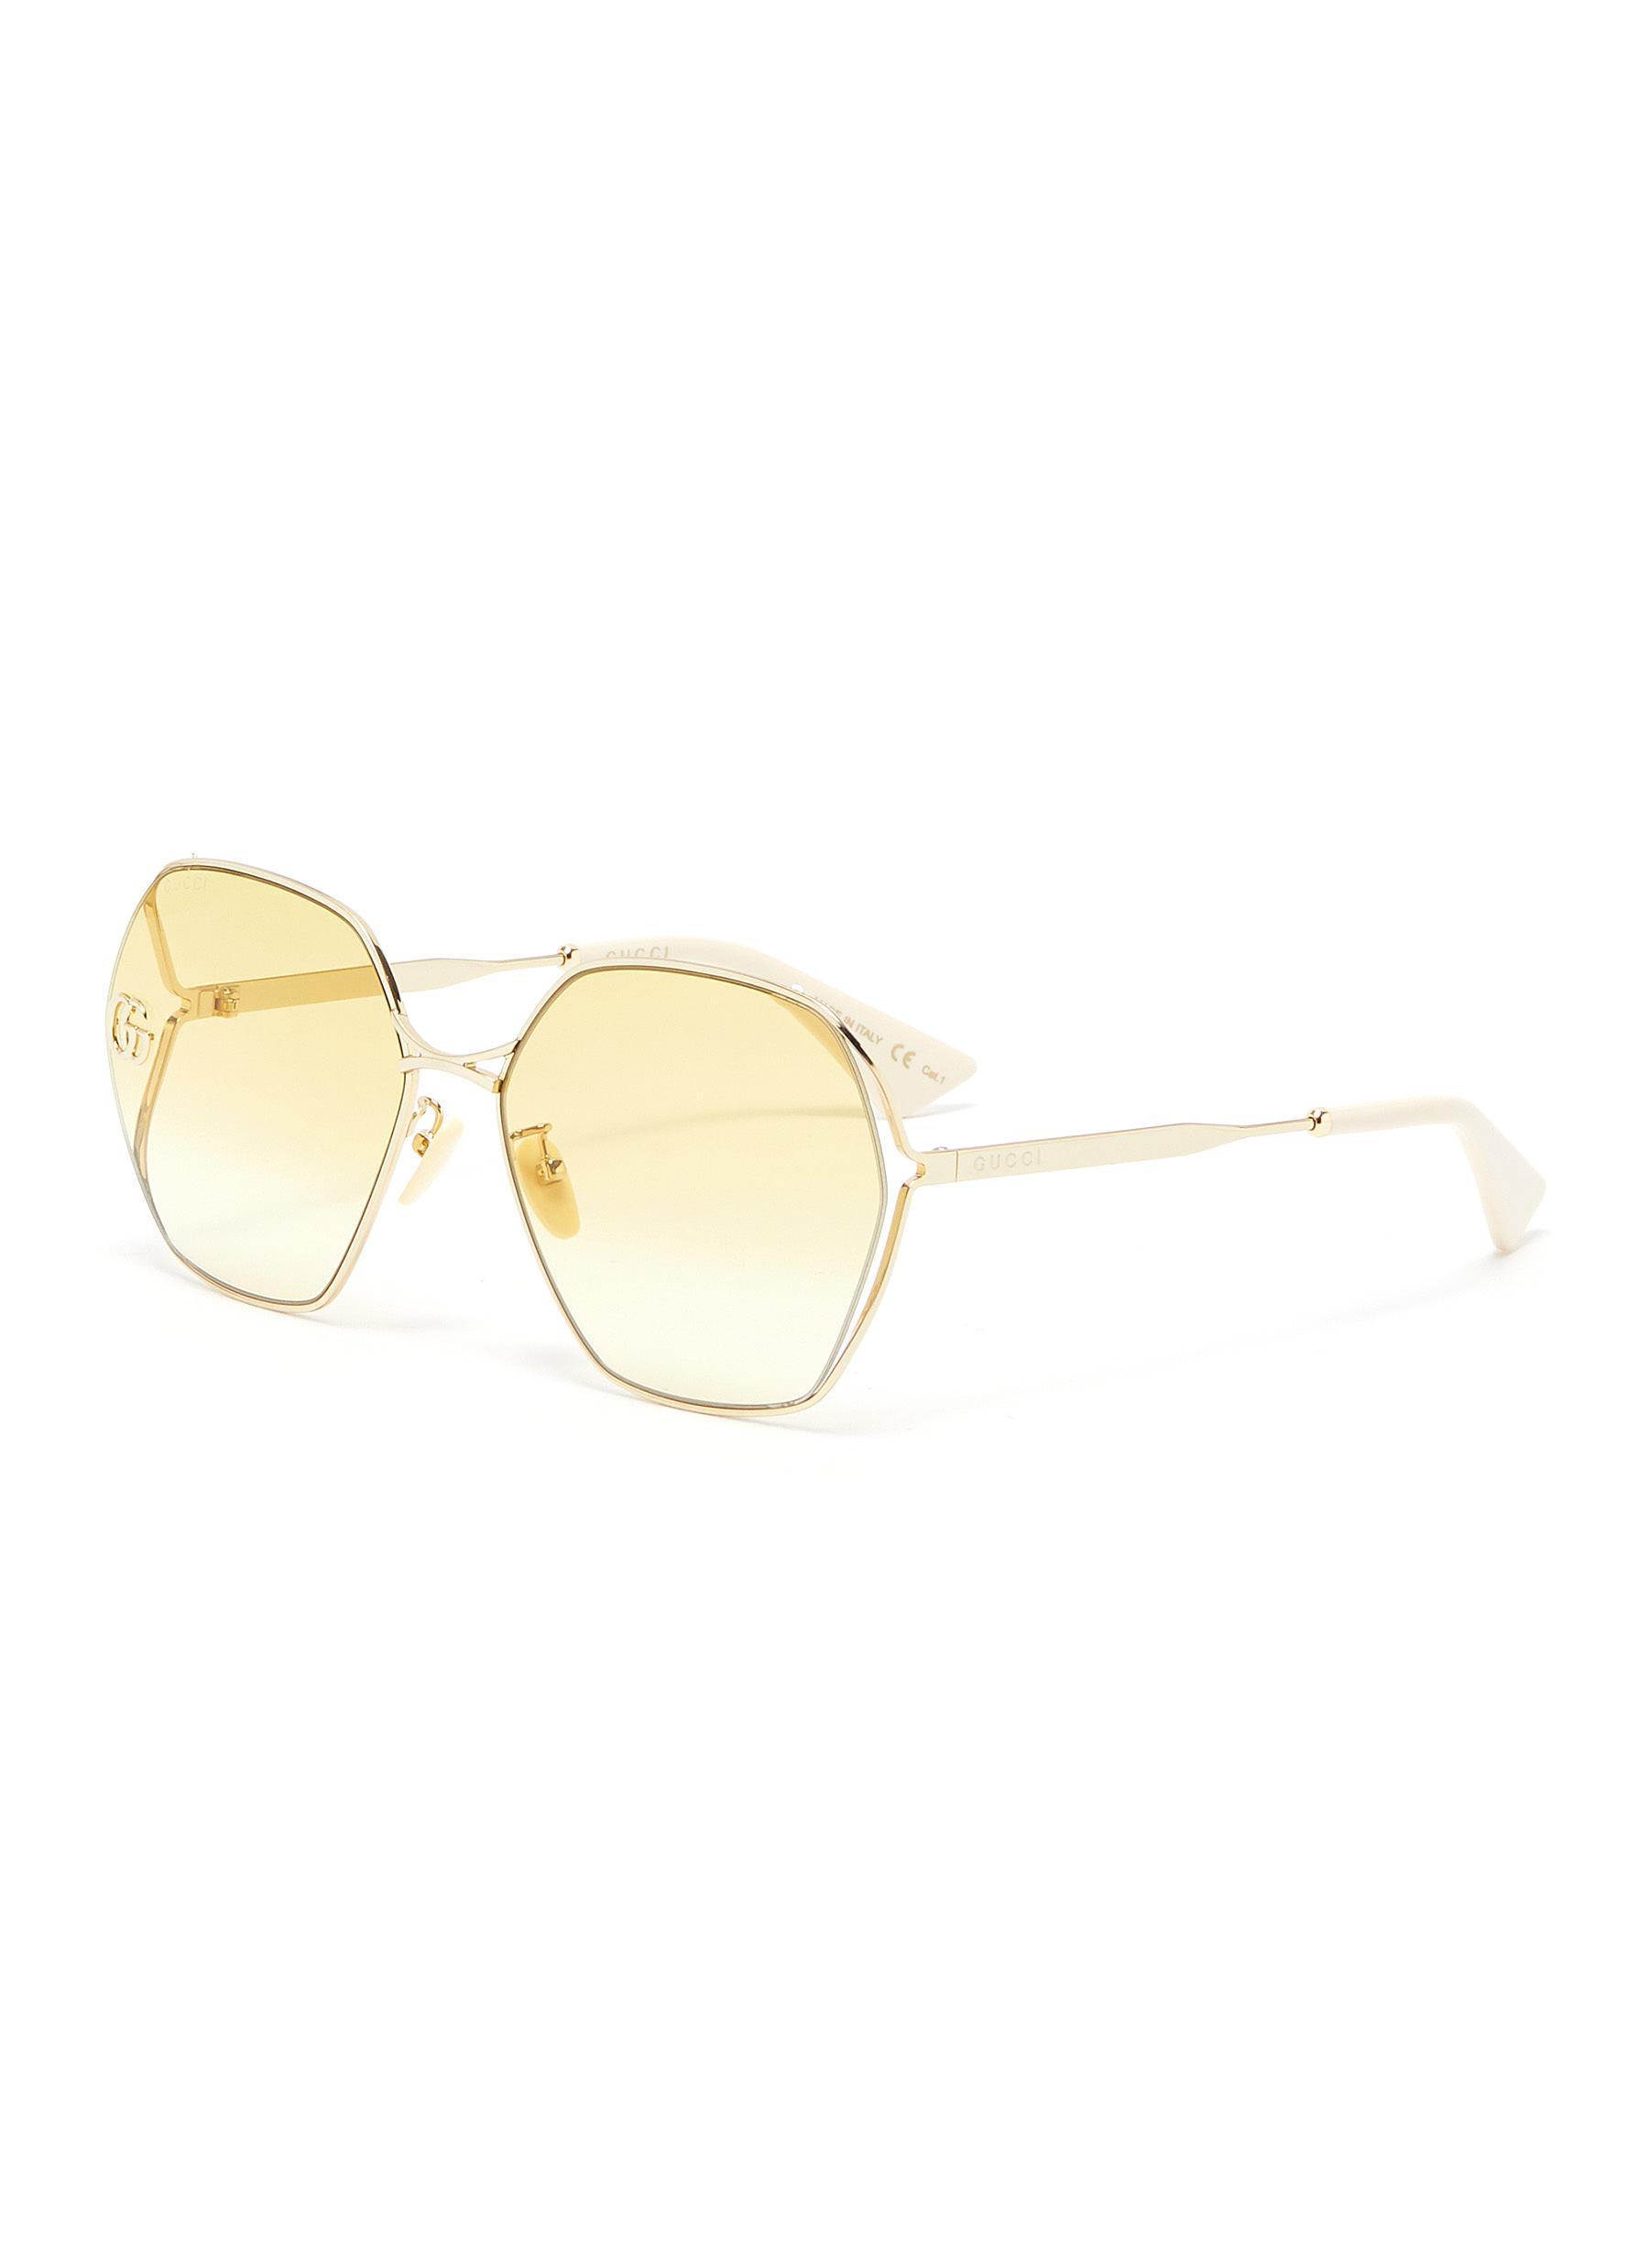 Gucci Sunglasses LOGO FORK HEXAGONAL METAL FRAME SUNGLASSES